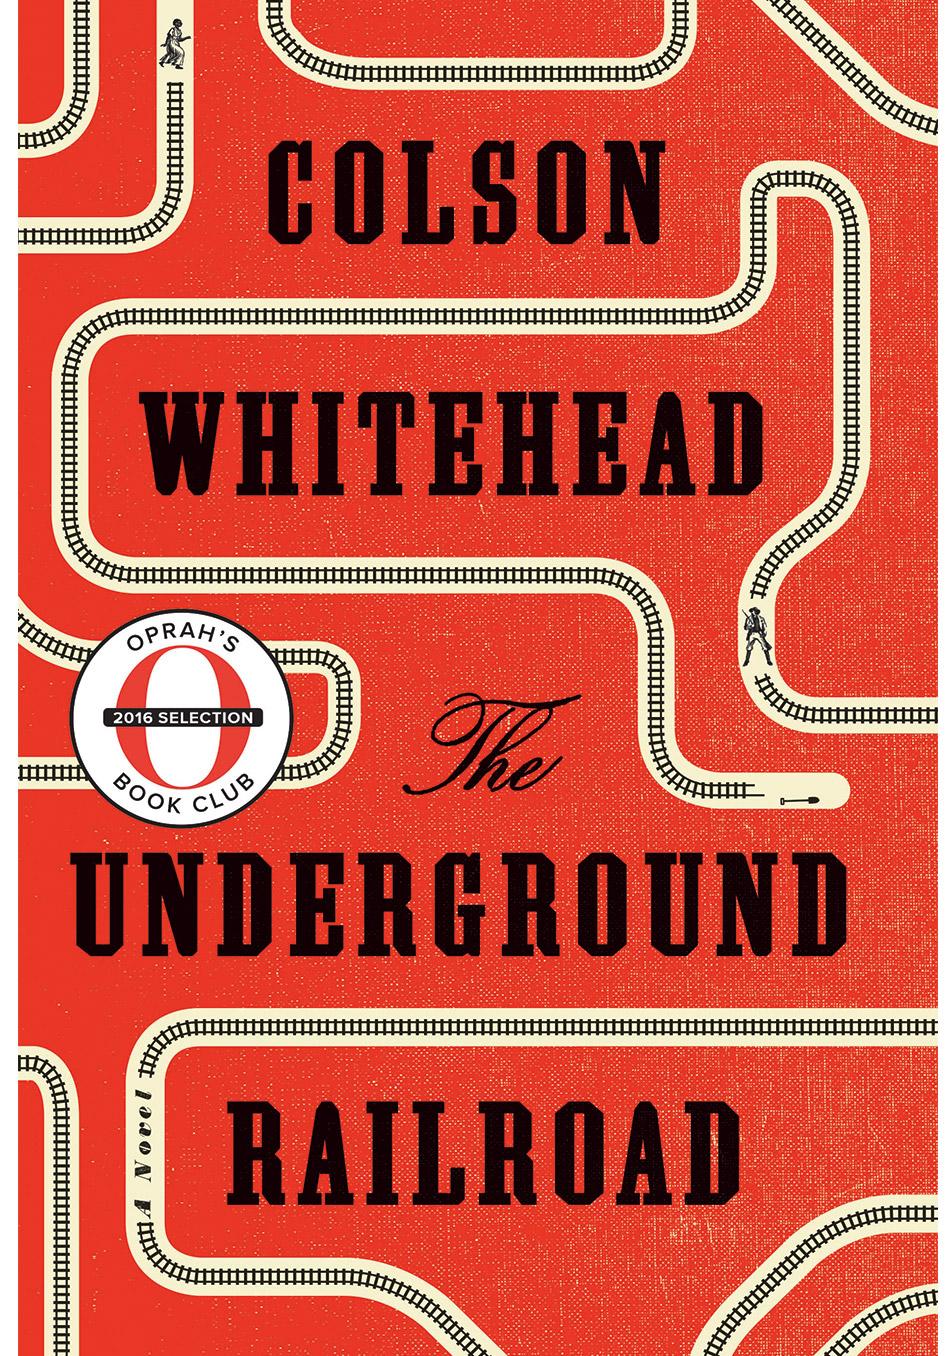 undergroundrailroad.jpg